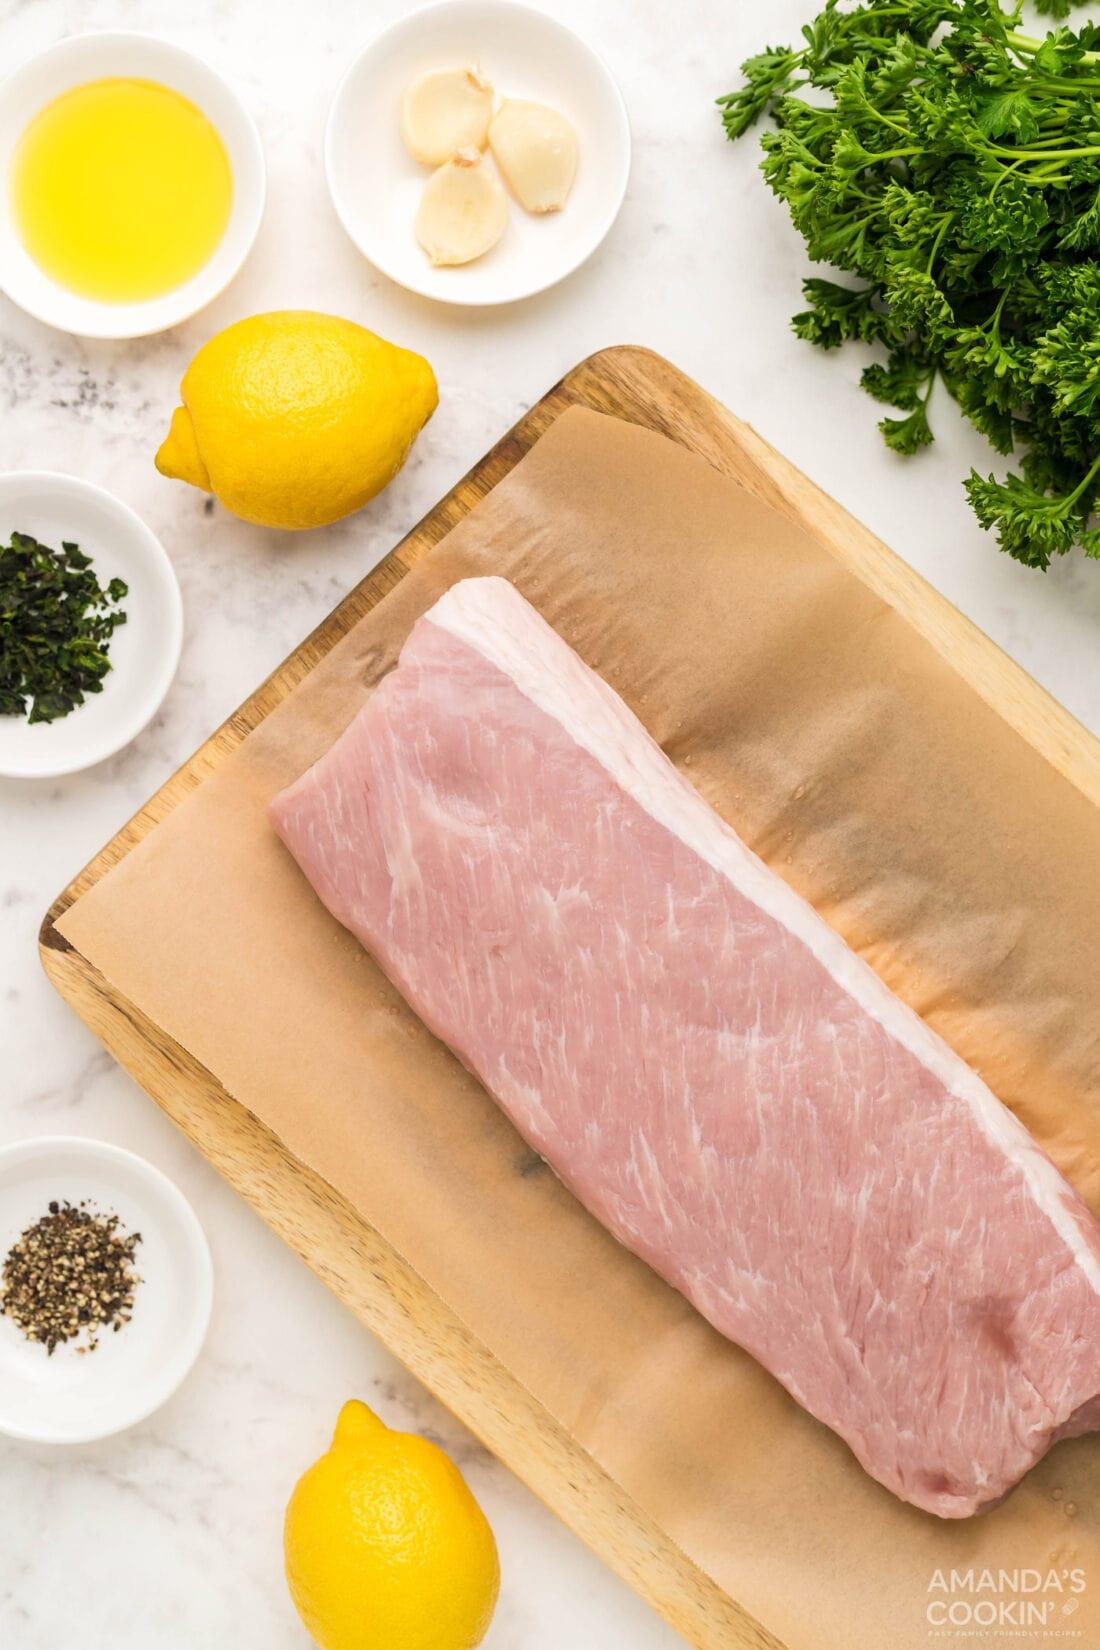 ingredients for Air Fryer Pork Tenderloin